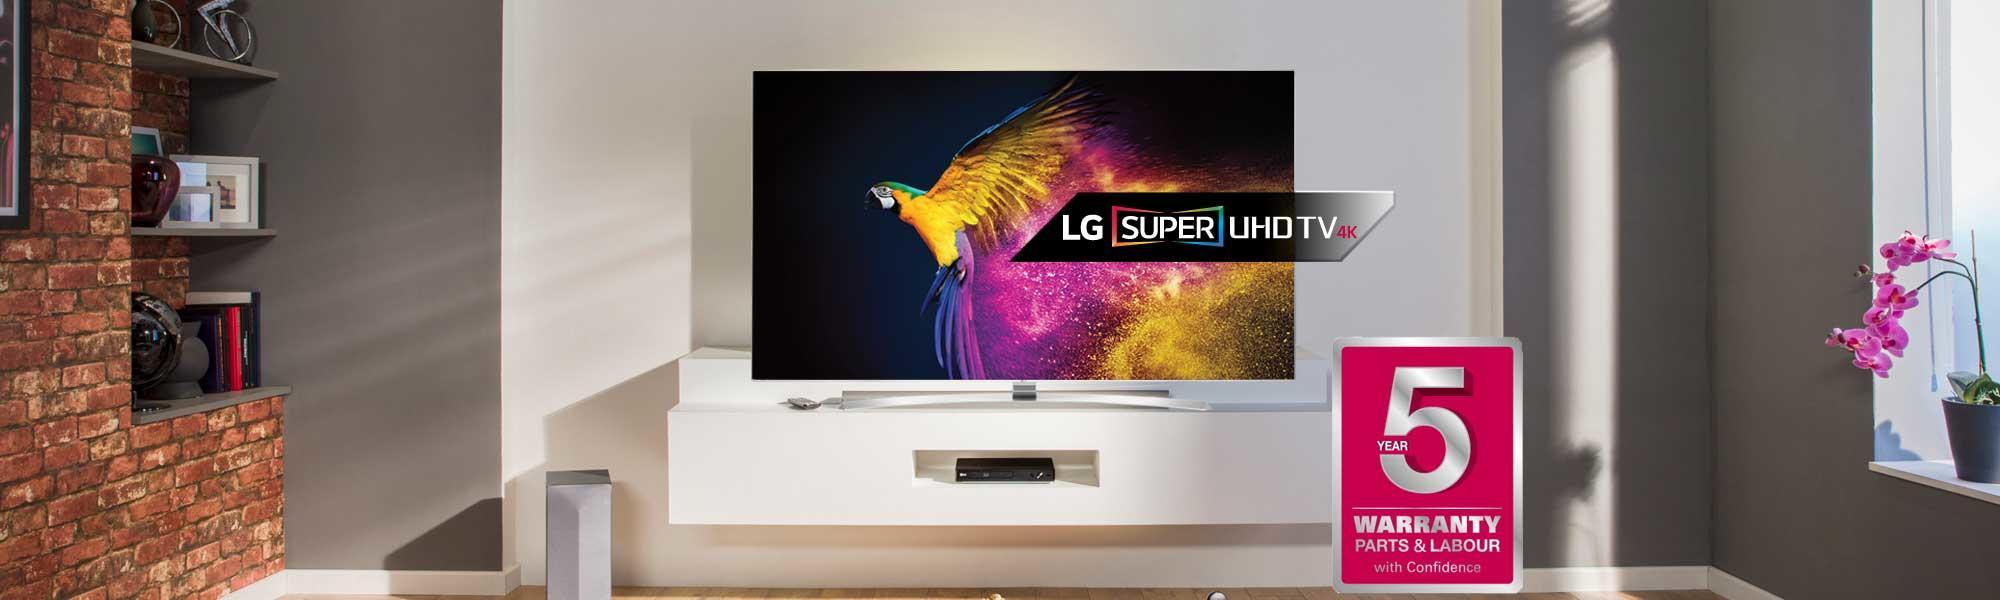 lg 55uh950v 55uh950v lg 4k hdr ultra hd led tv. Black Bedroom Furniture Sets. Home Design Ideas